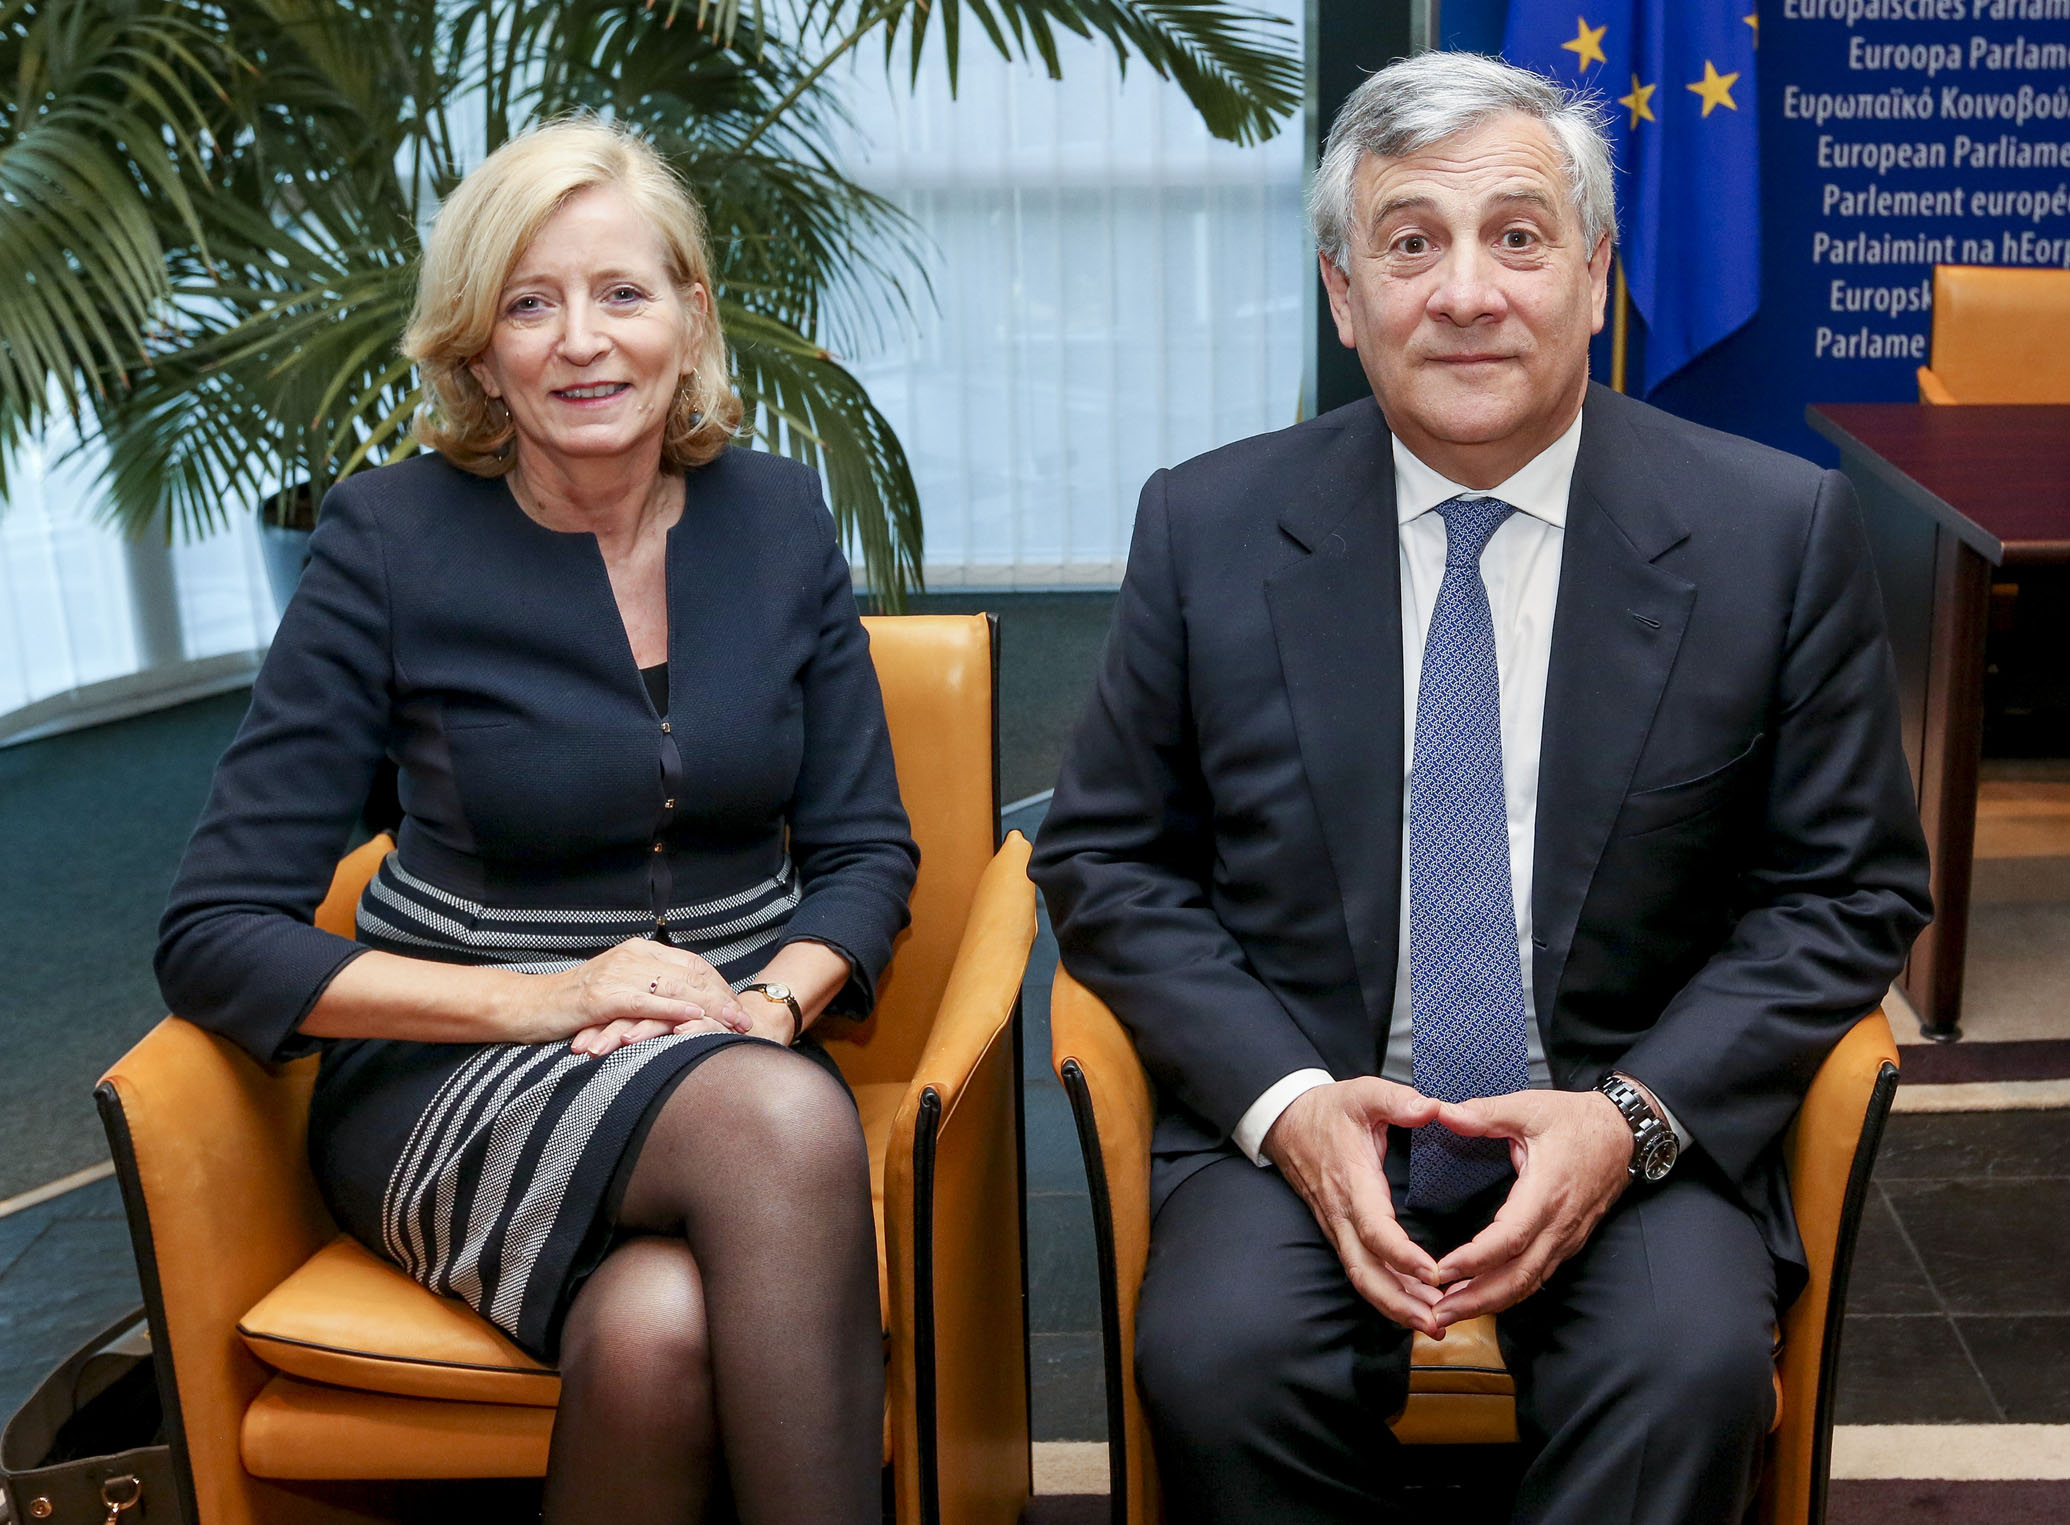 Den Europæiske Ombudsmand i et møde med formanden for Europa-Parlamentet Antonio Tajani.